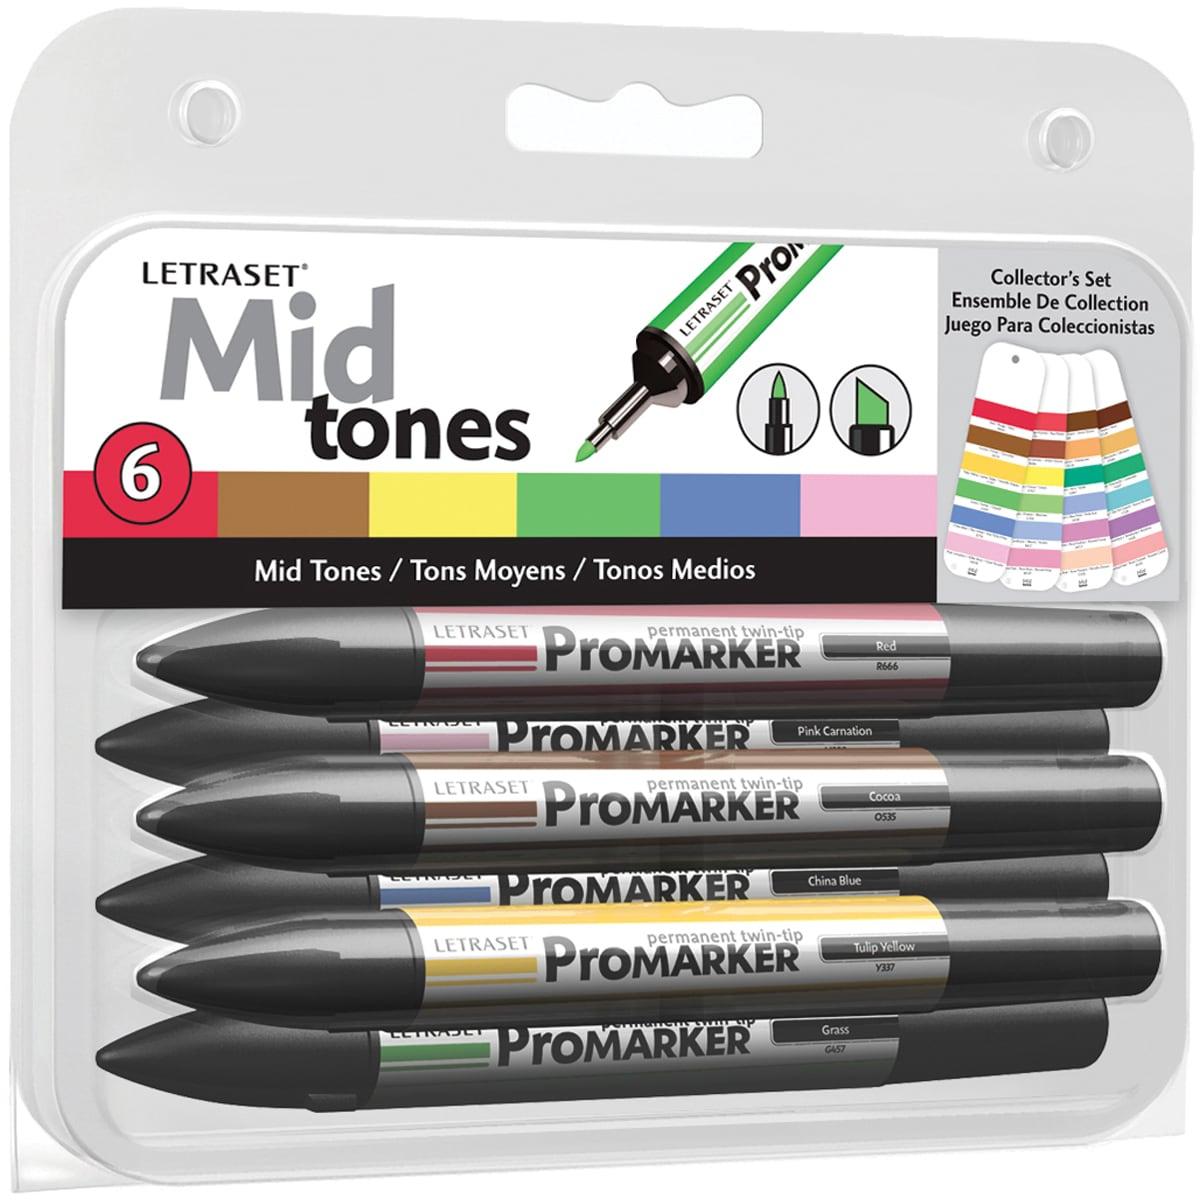 Letraset ProMarker Collector's Set 6/Pkg-Mid Tones